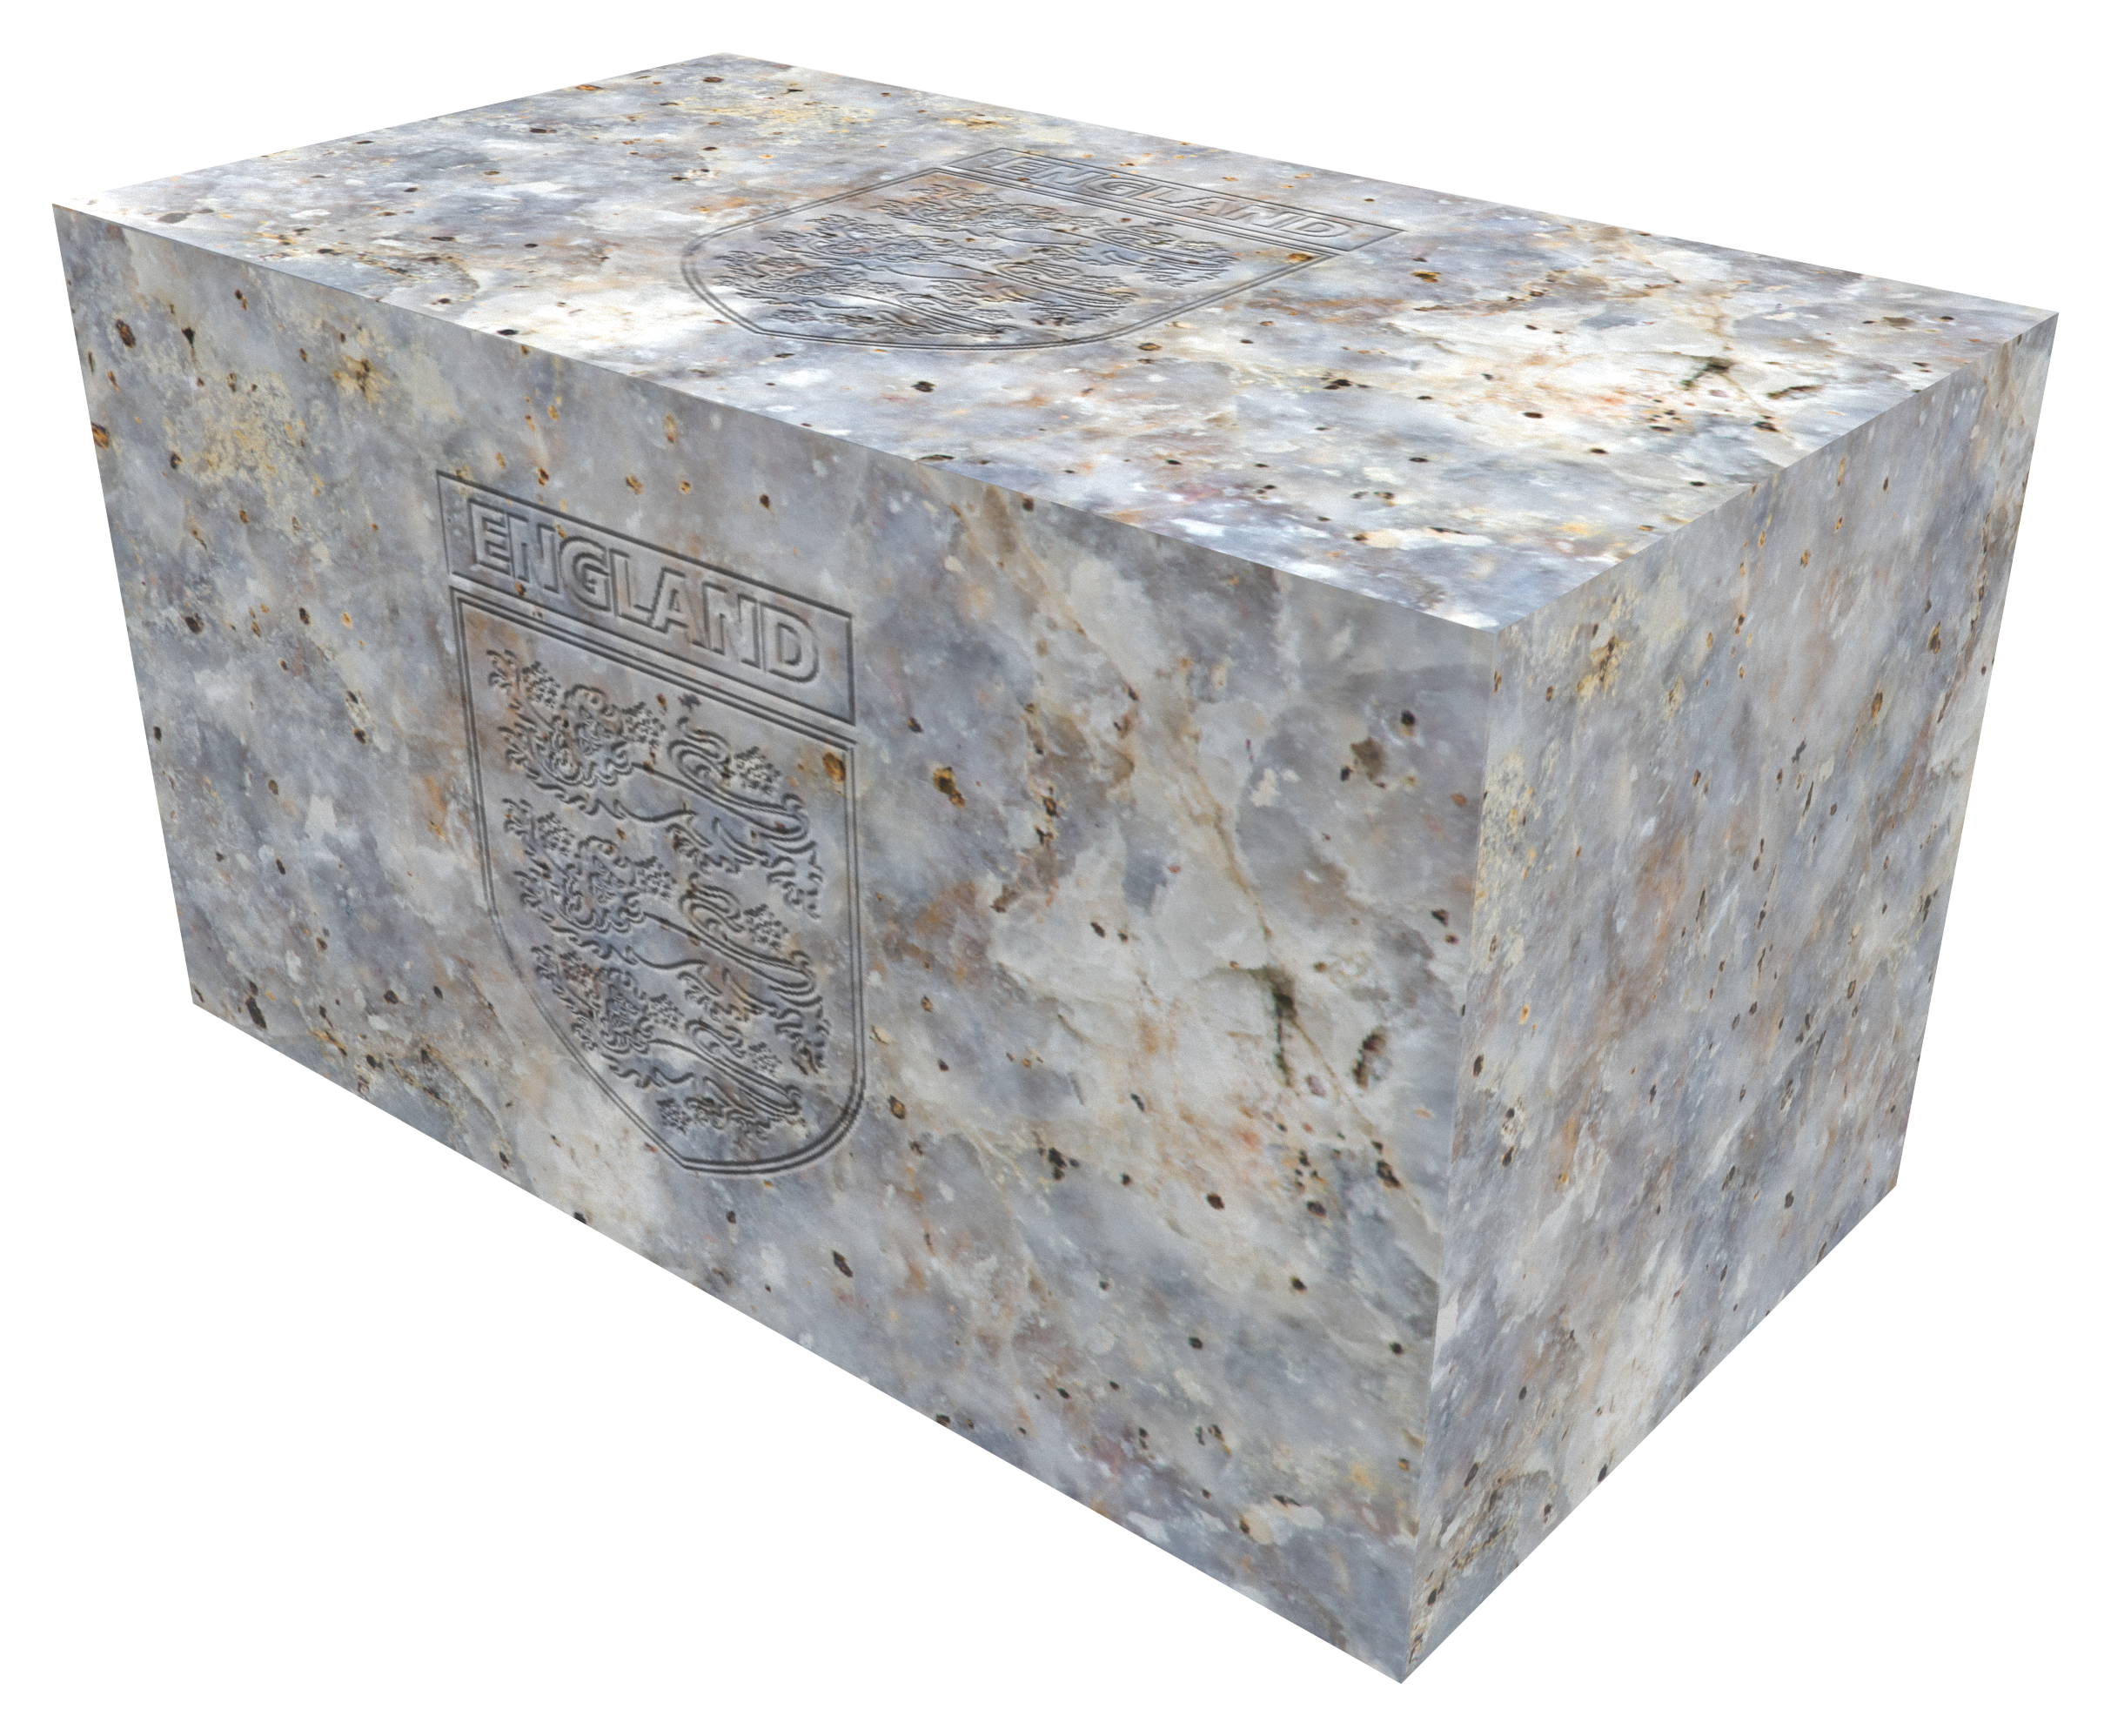 Ashes Casket Urn KASHMIR WHITE with Engr